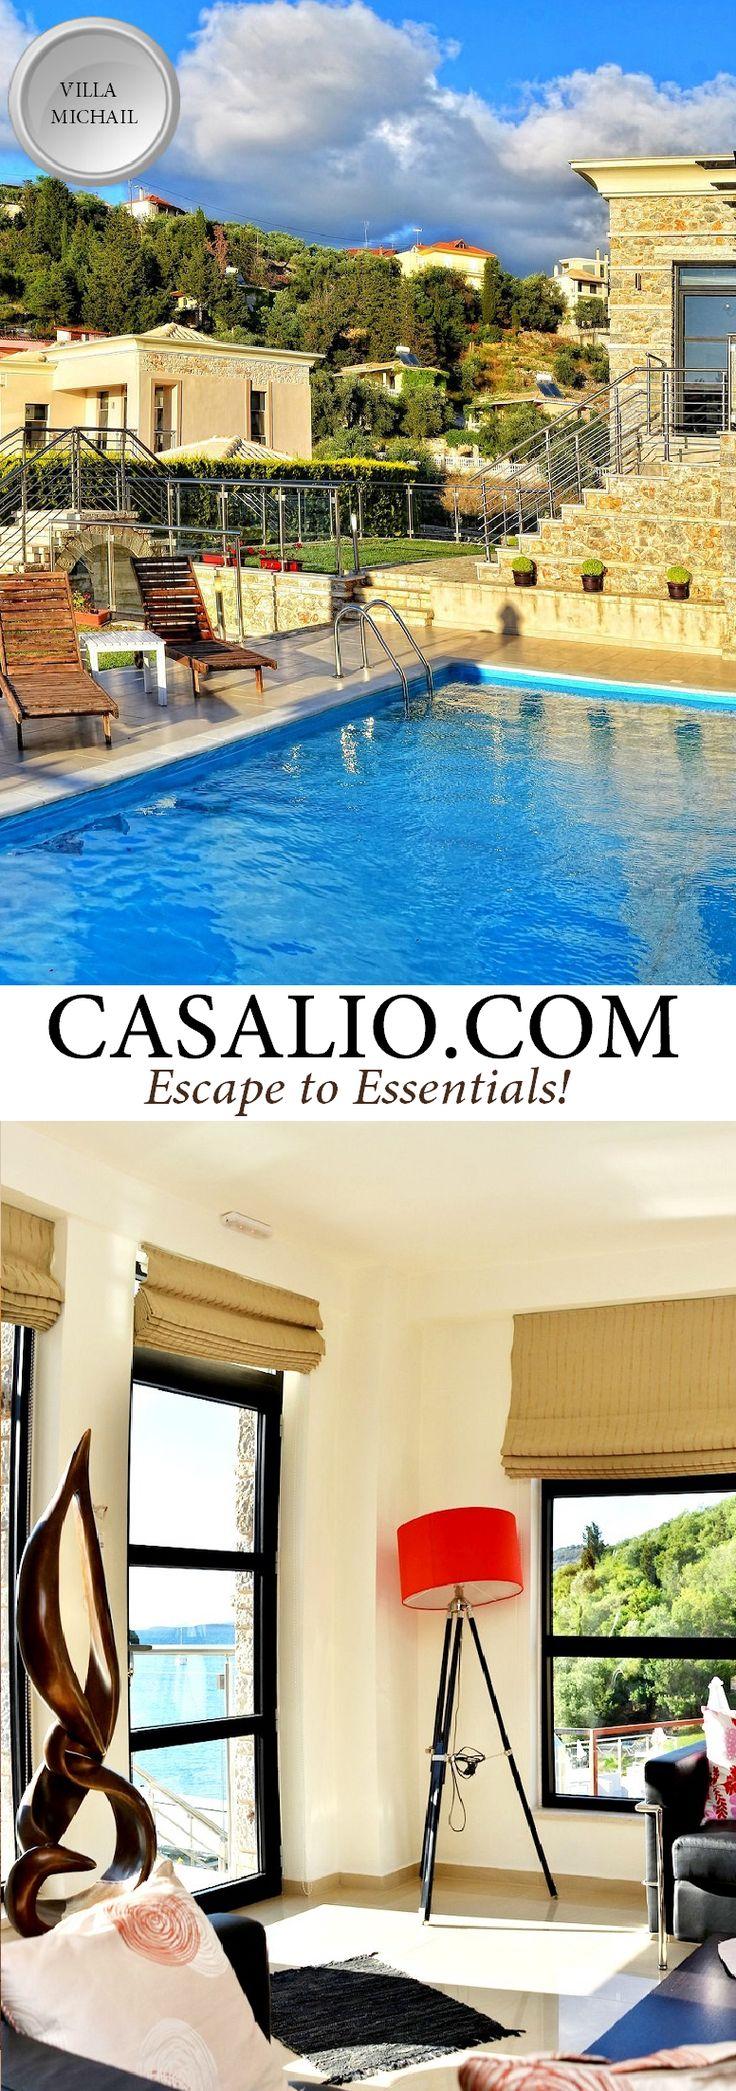 Ferienvilla   Villa Rental Ferienhaus www.casalio.com    Villa Michail    Greece - Karvouno    Luxurious villa, fully airconditioned, Karvouno Beach, 2 bedrooms, private pool, seaview. #Luxury #Villas #LuxuryVillas #Greece #Karvouno #BeachFront #BeachVacation #Rental #LuxuryTravel #Travel #LuxuryLife #LuxuryLifeStyle #LuxuryTravel #luxuryhotels (Pinned by #Casalio - www.casalio.com) Our travel blog - www.casaliotravel.com